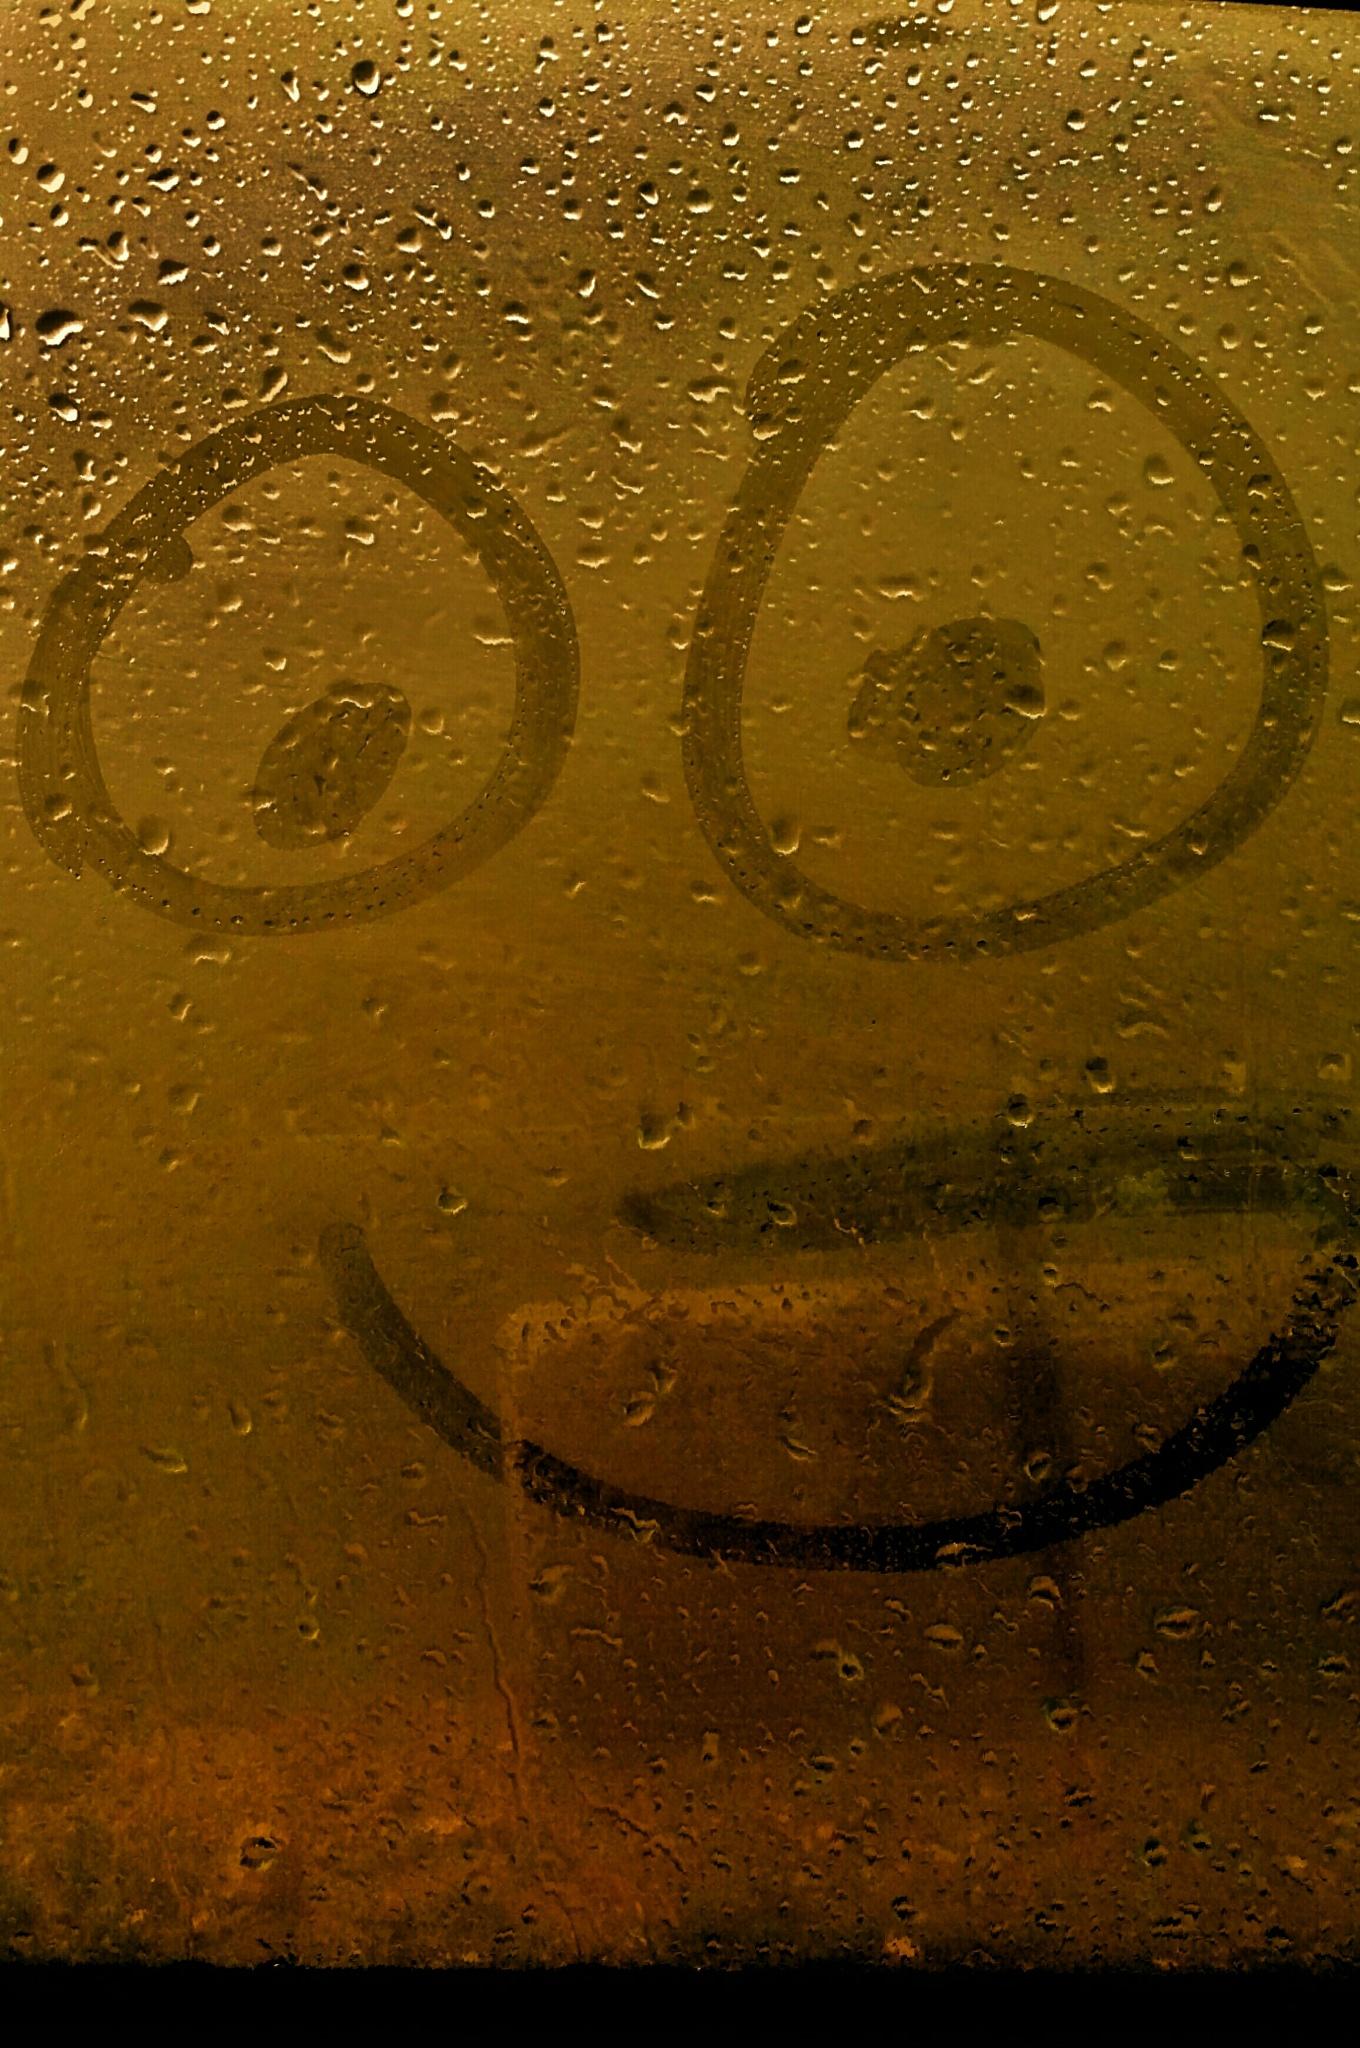 Smile by BalrajSingh